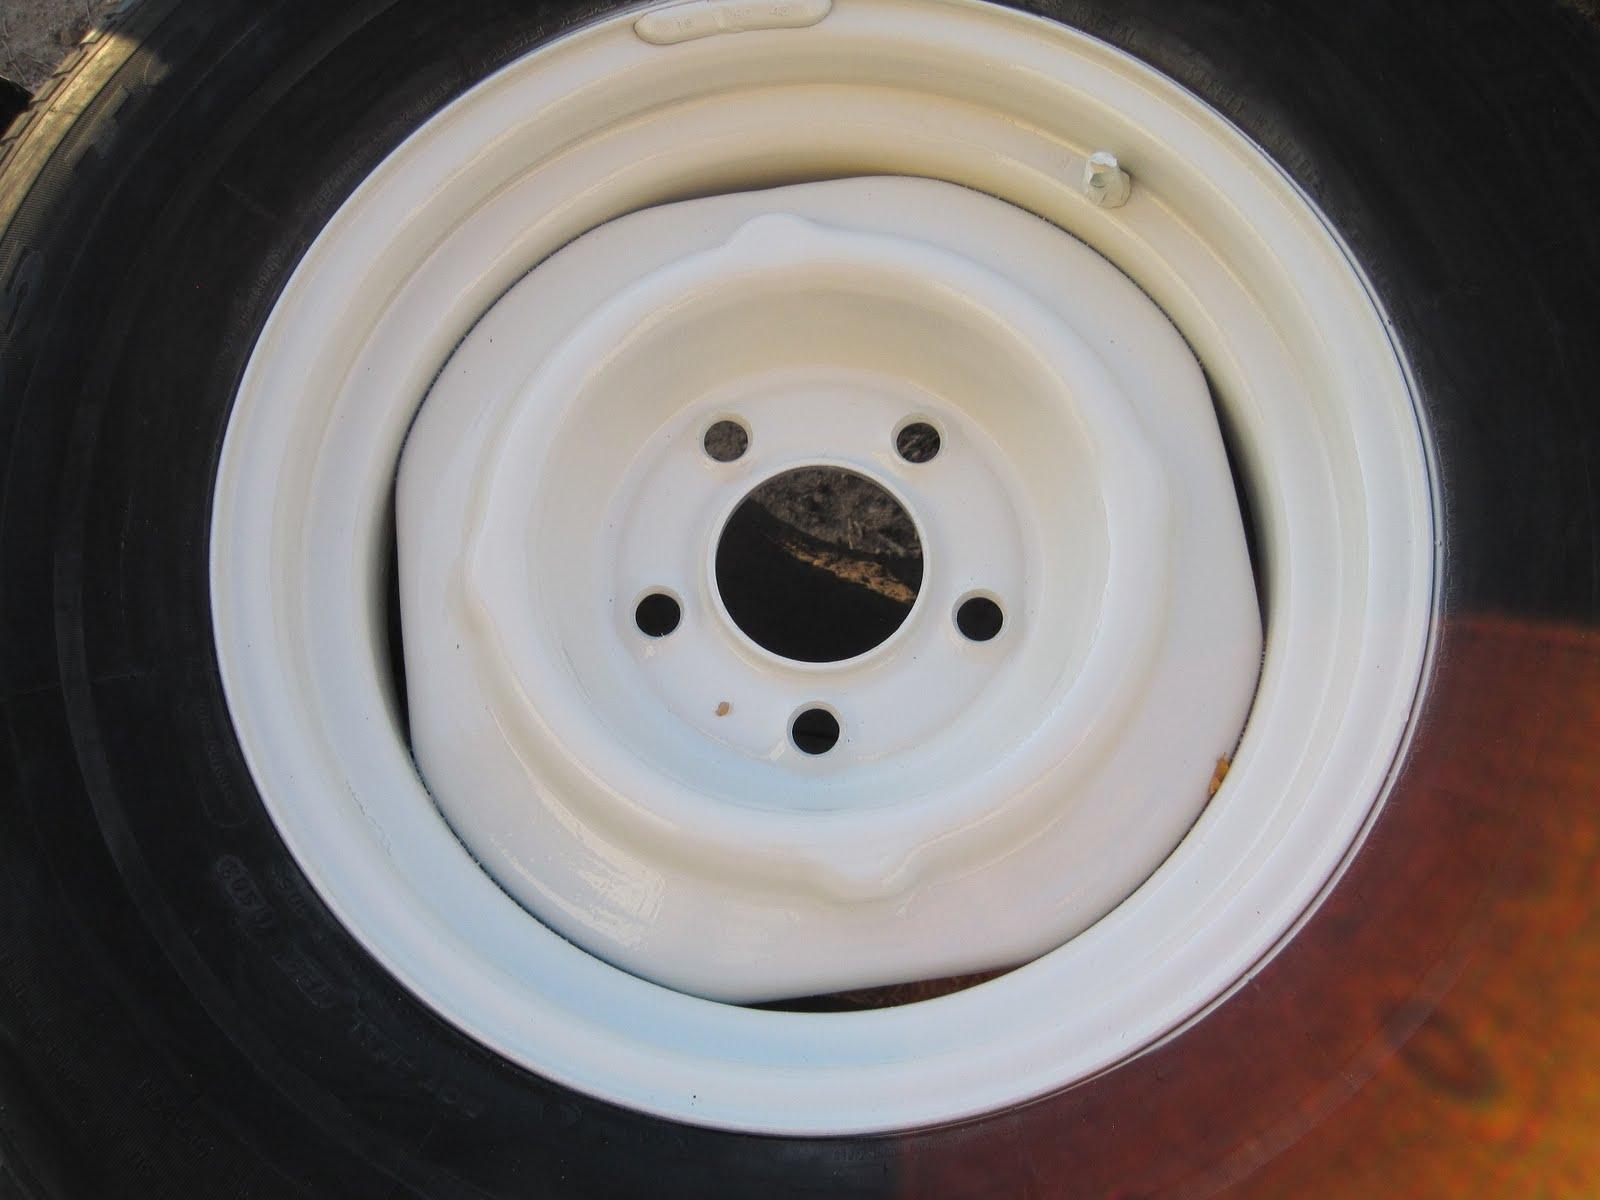 Plain Steel Rims Painted White